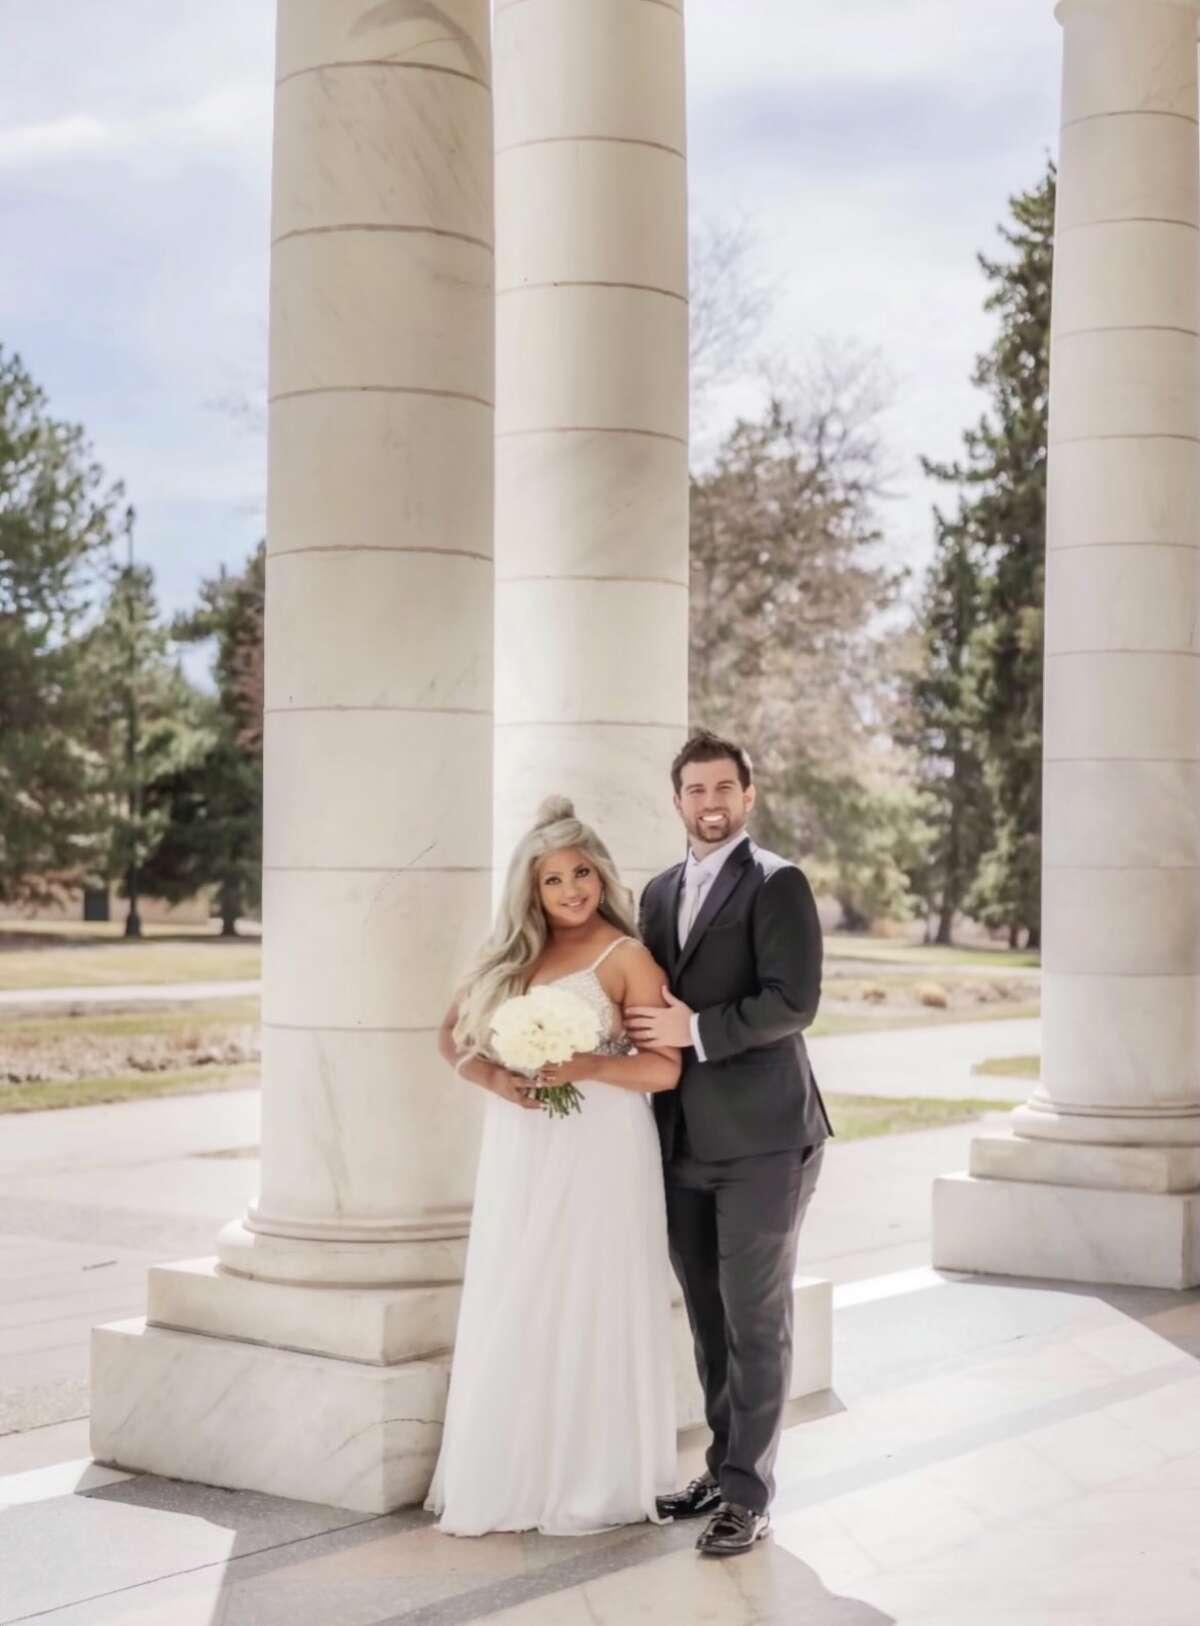 Bridget Smith married her longtime boyfriend on March 28, 2021.